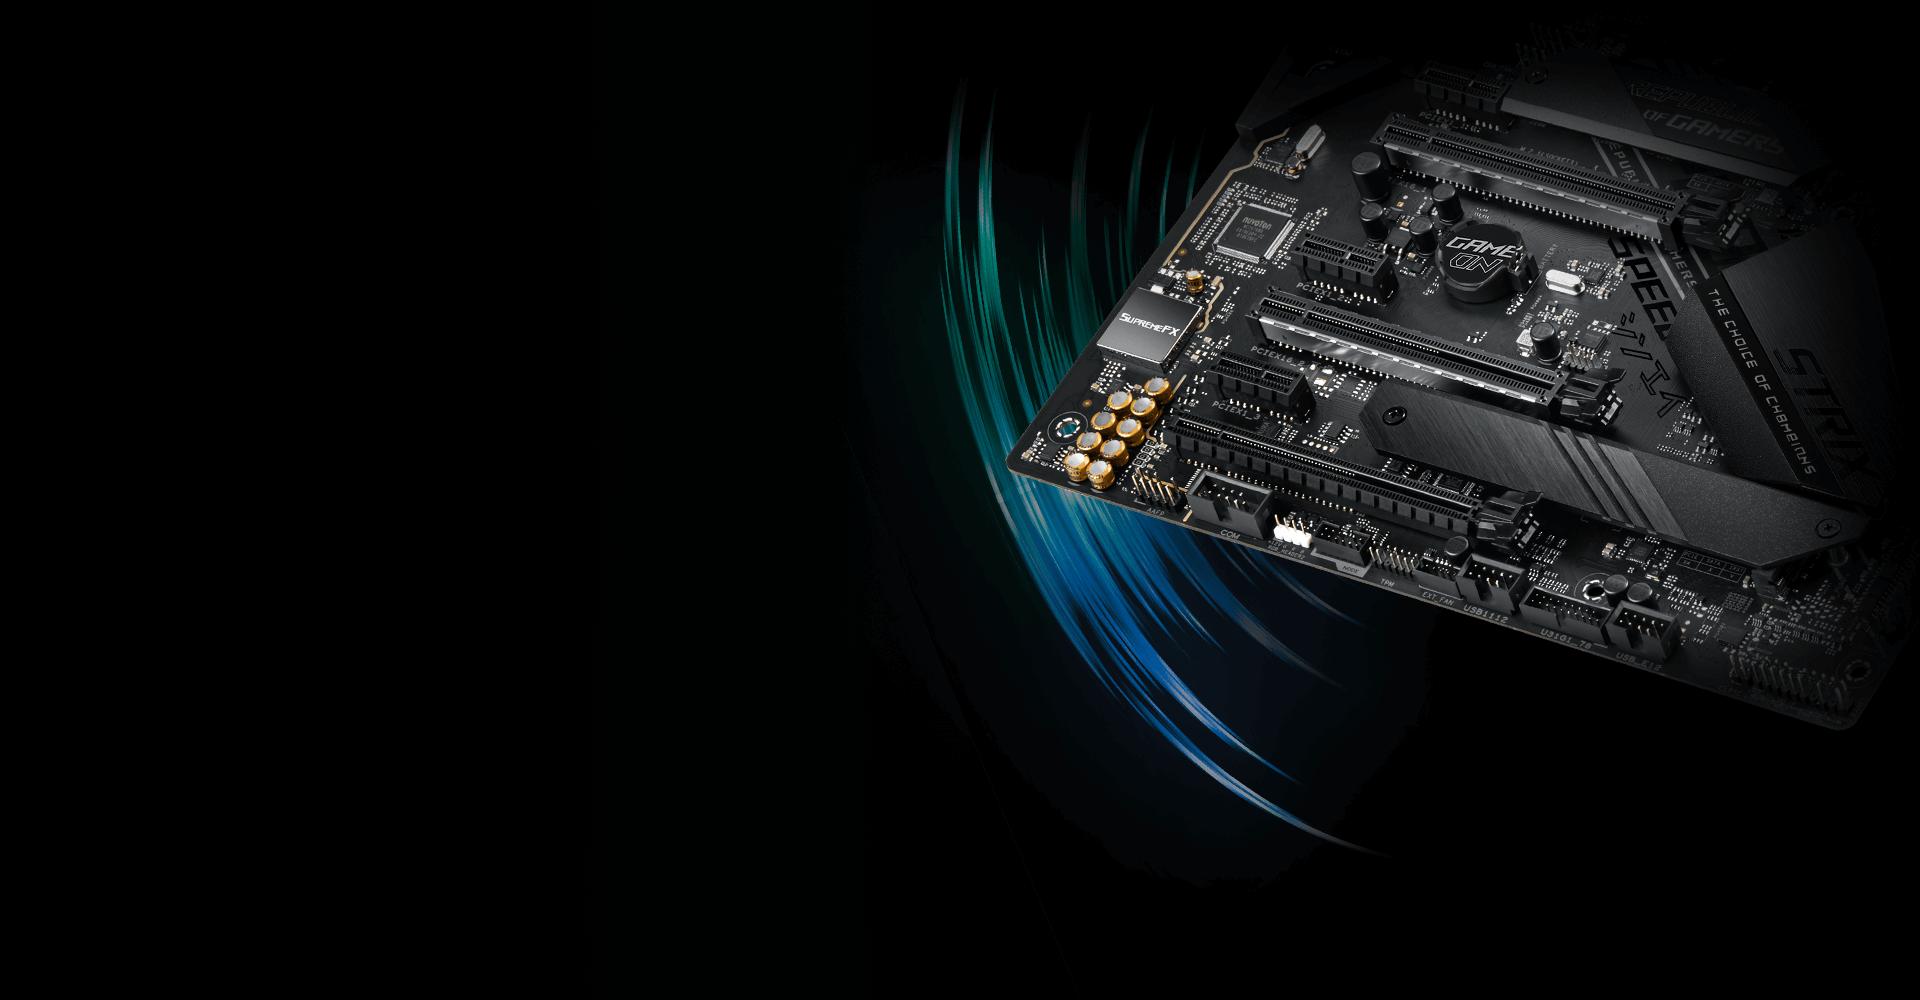 ASUS ROG STRIX Z390-E GAMING | Gaming Motherboard | ASUS USA